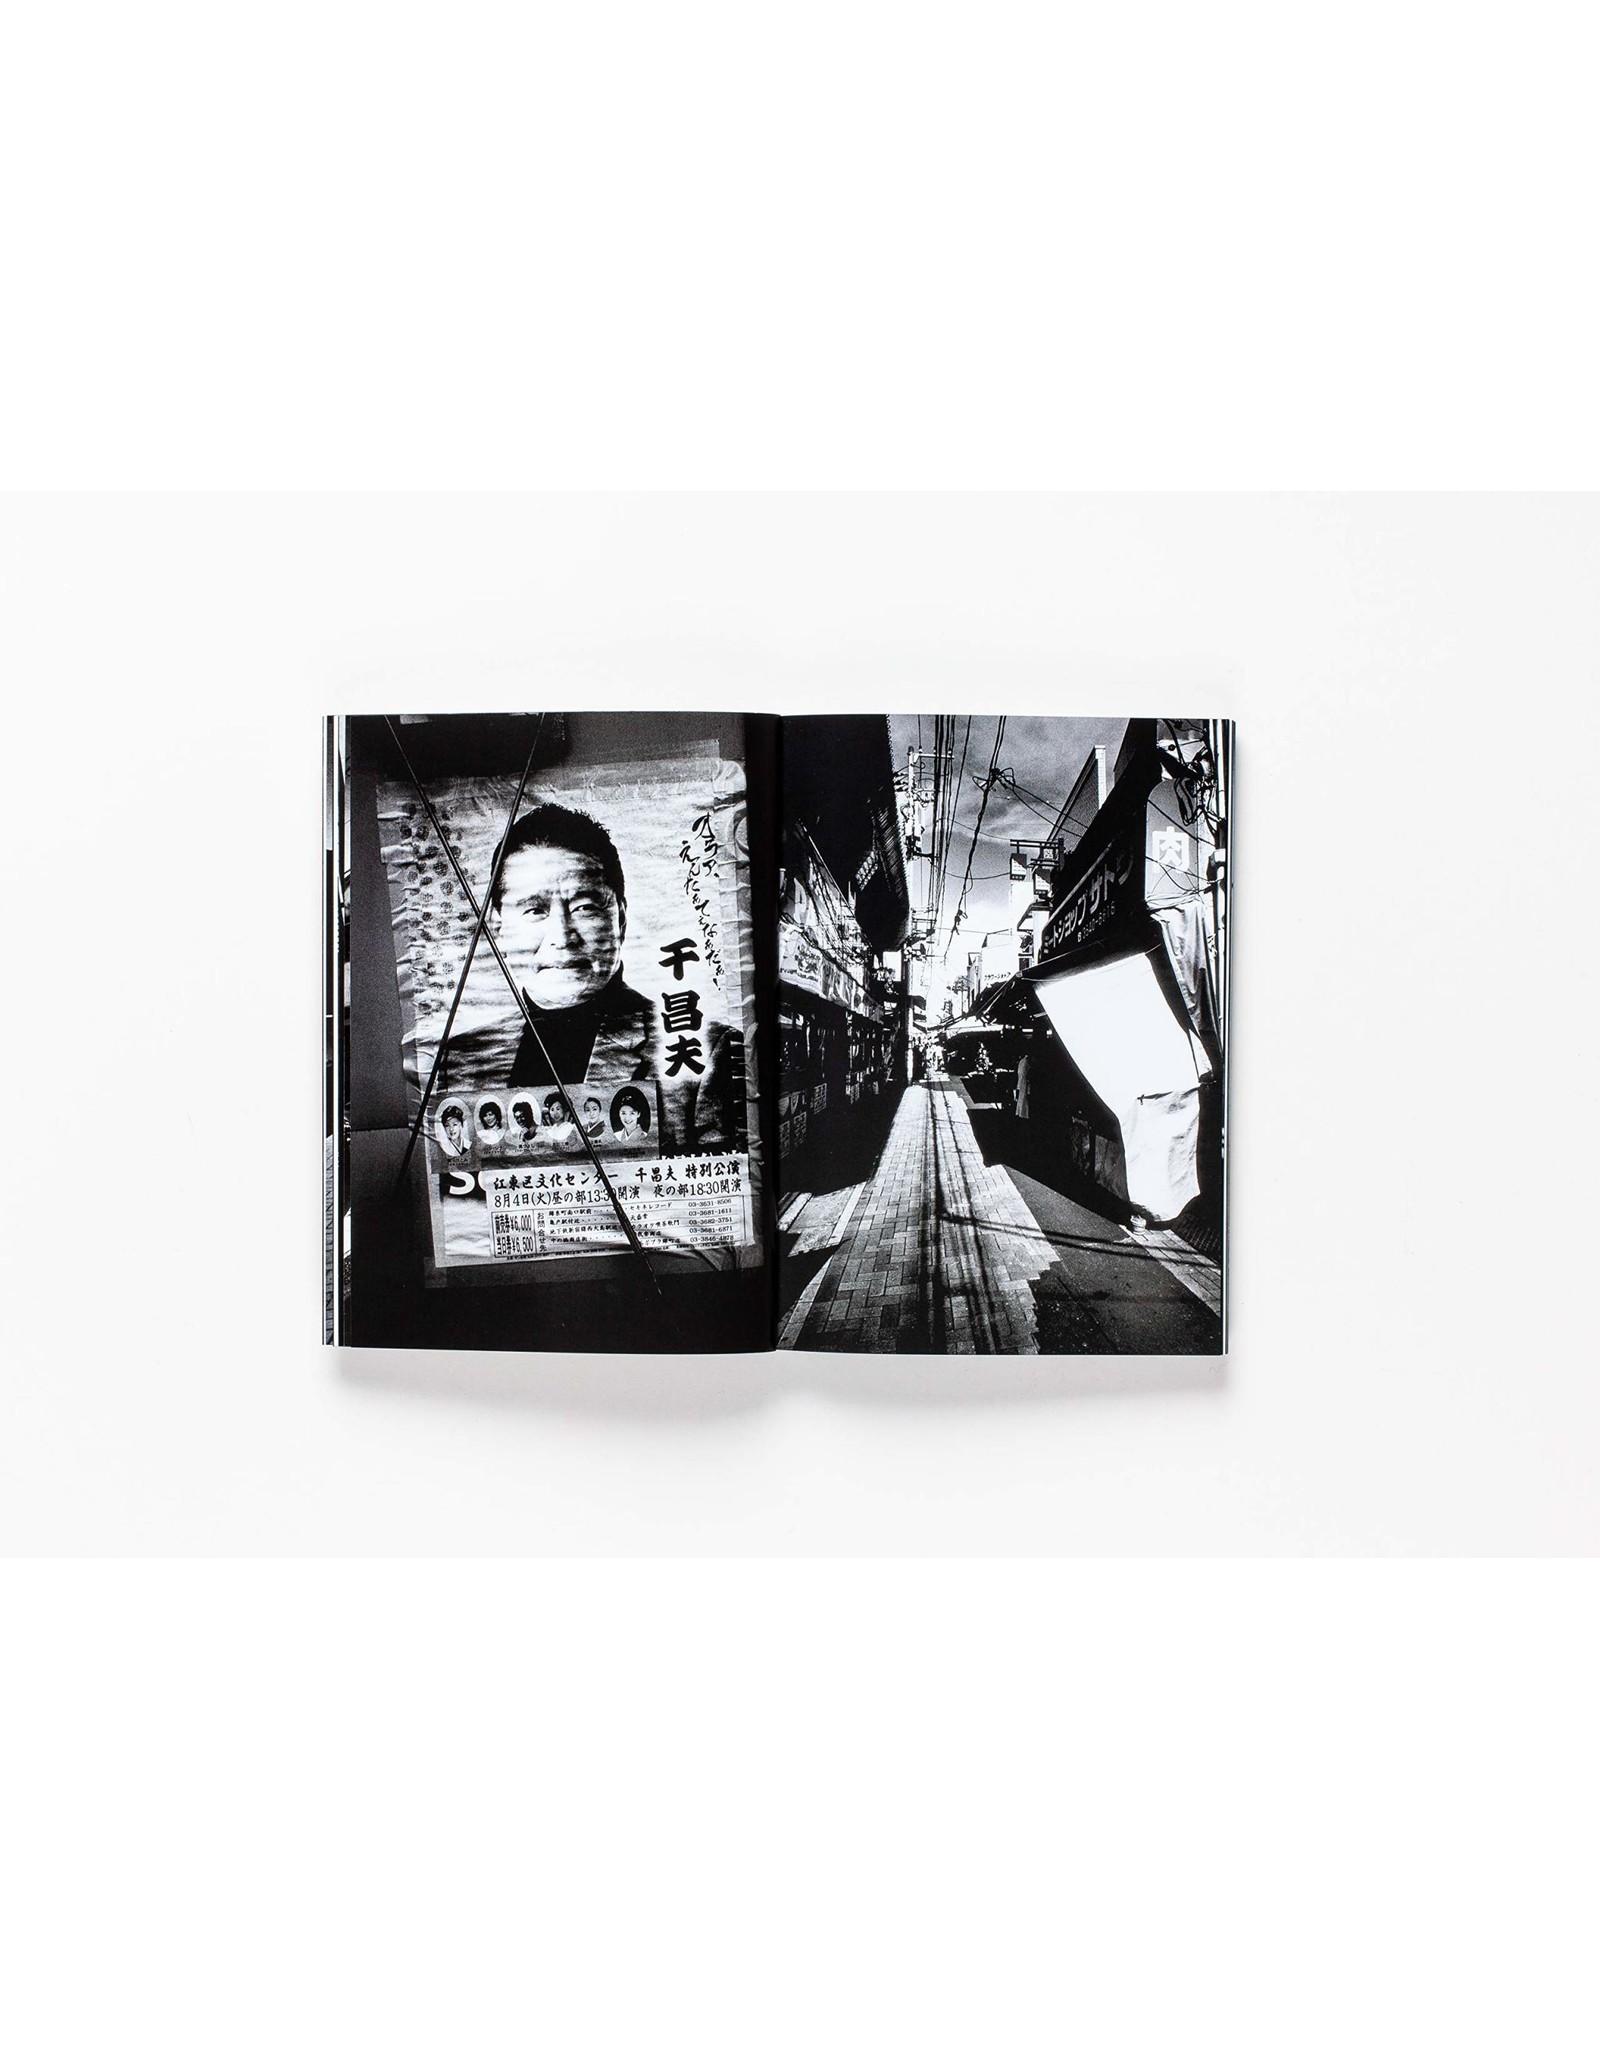 Daido Moriyama: How I Take Photographs